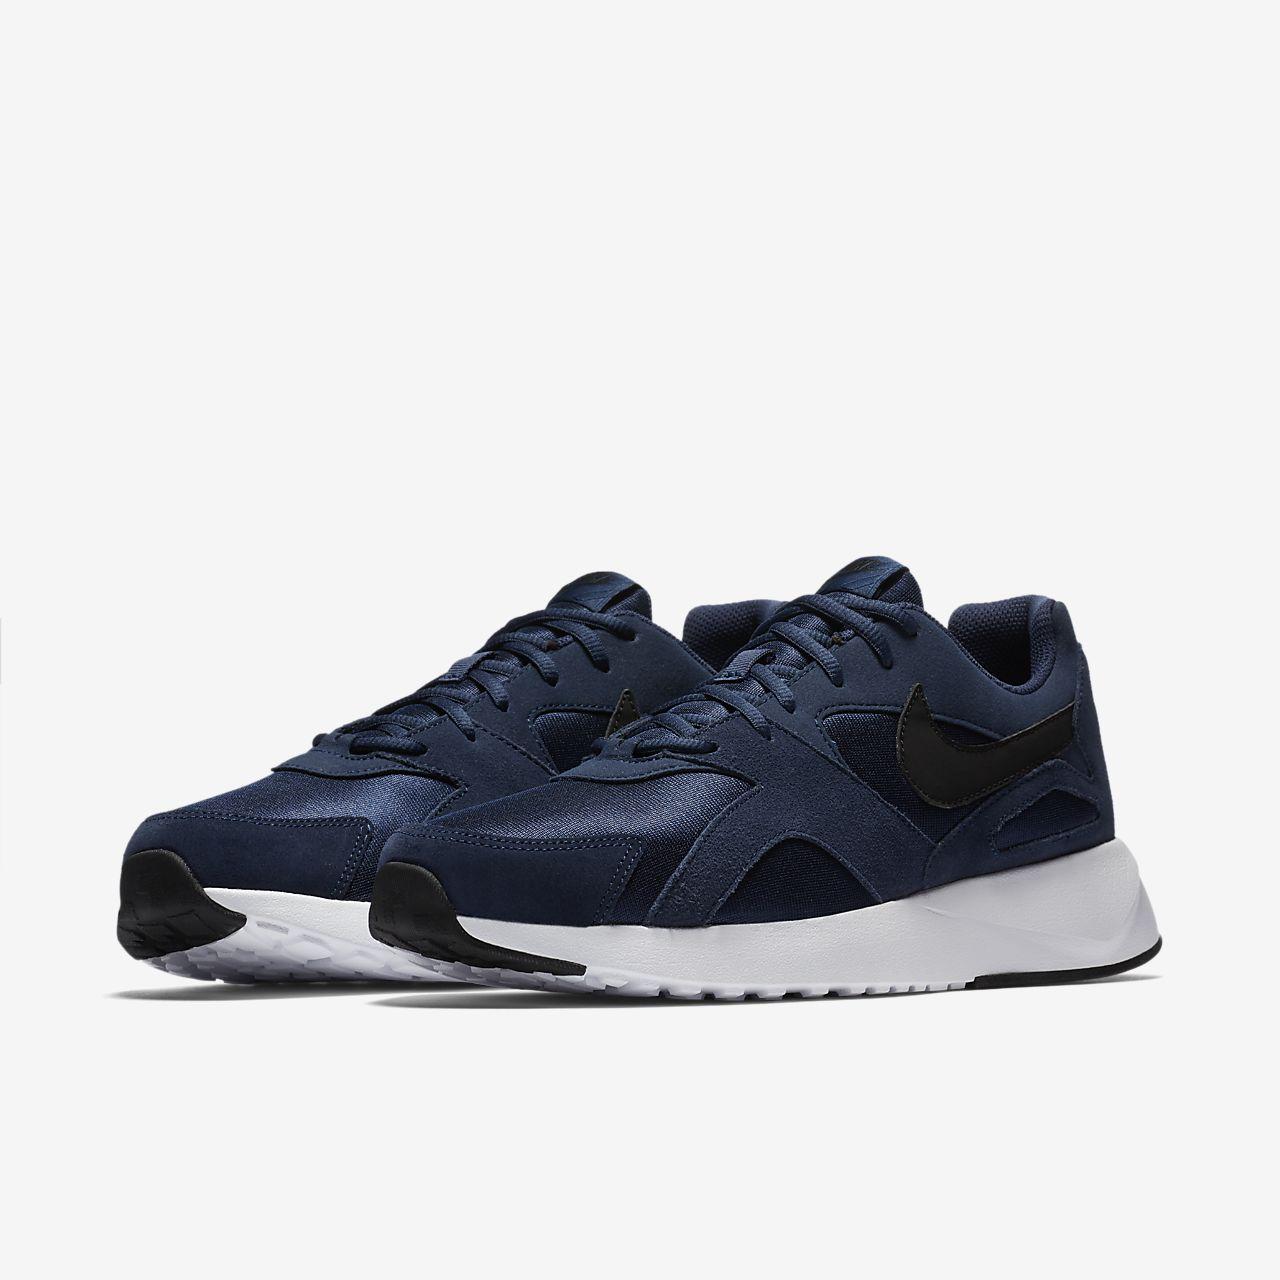 Pantheos Chaussures Nike Blanc Noir ZxM6HQtLA